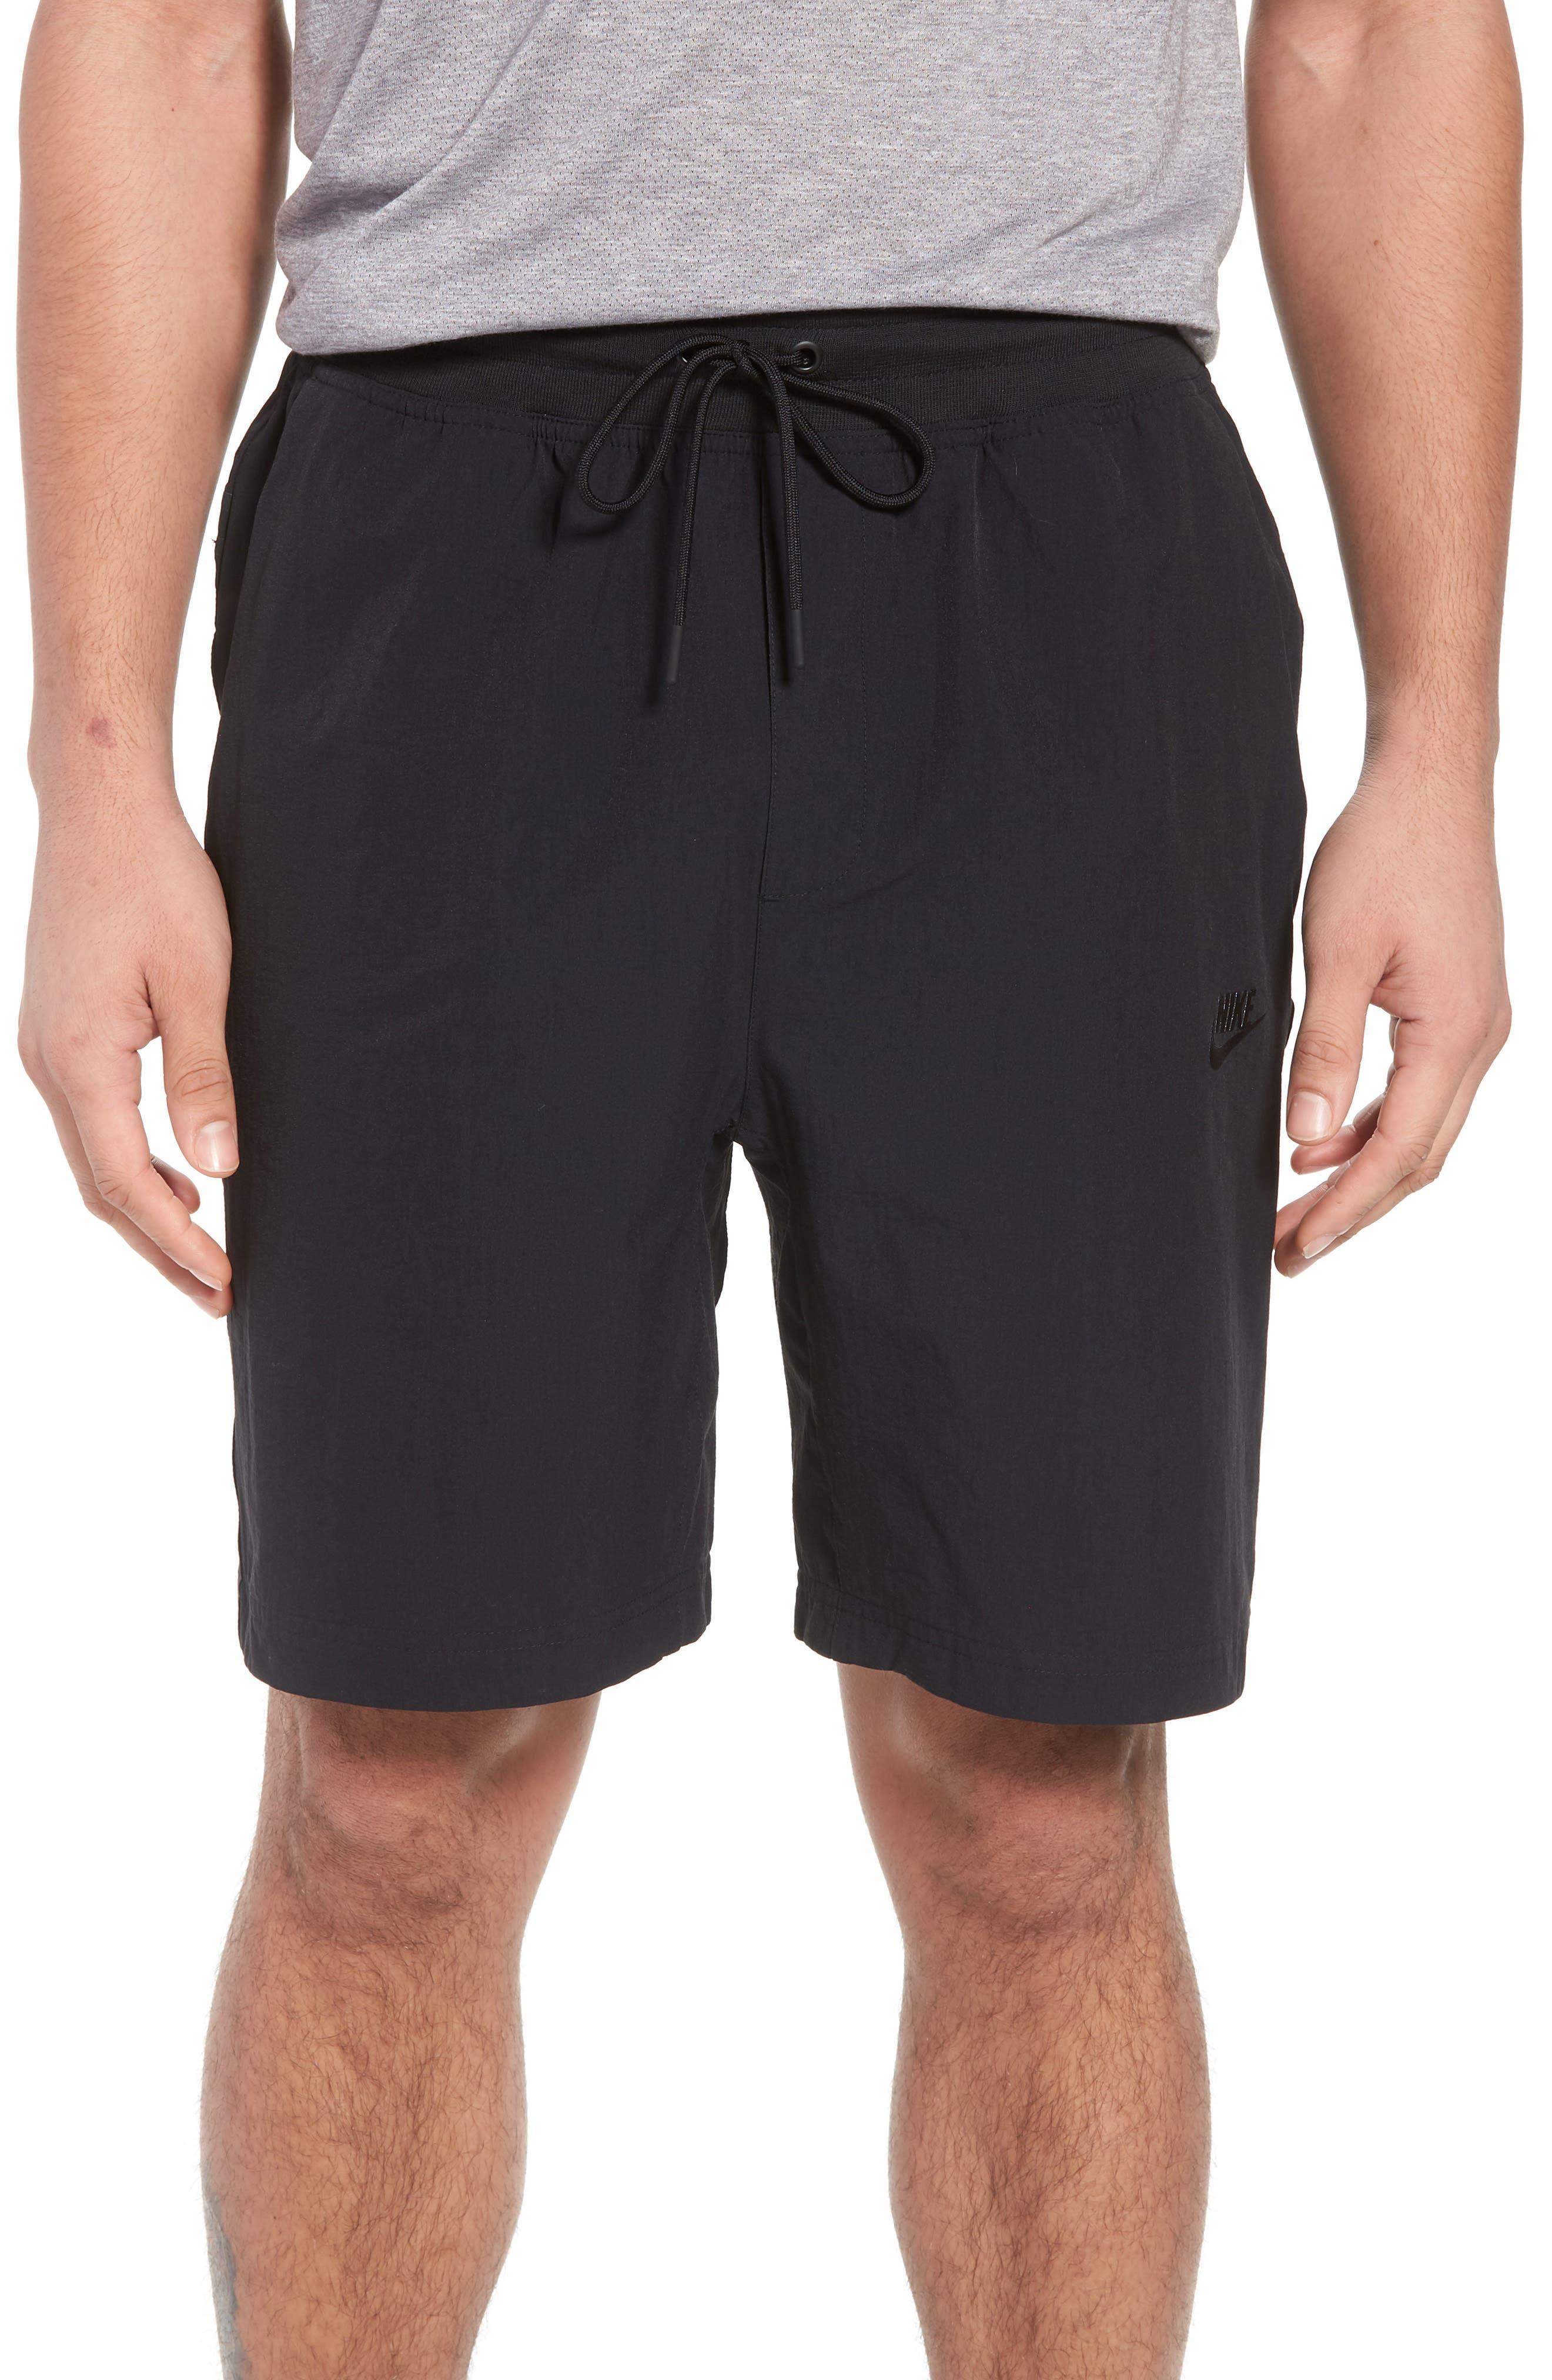 Sportswear Woven Shorts,                             Main thumbnail 1, color,                             Black/ Black